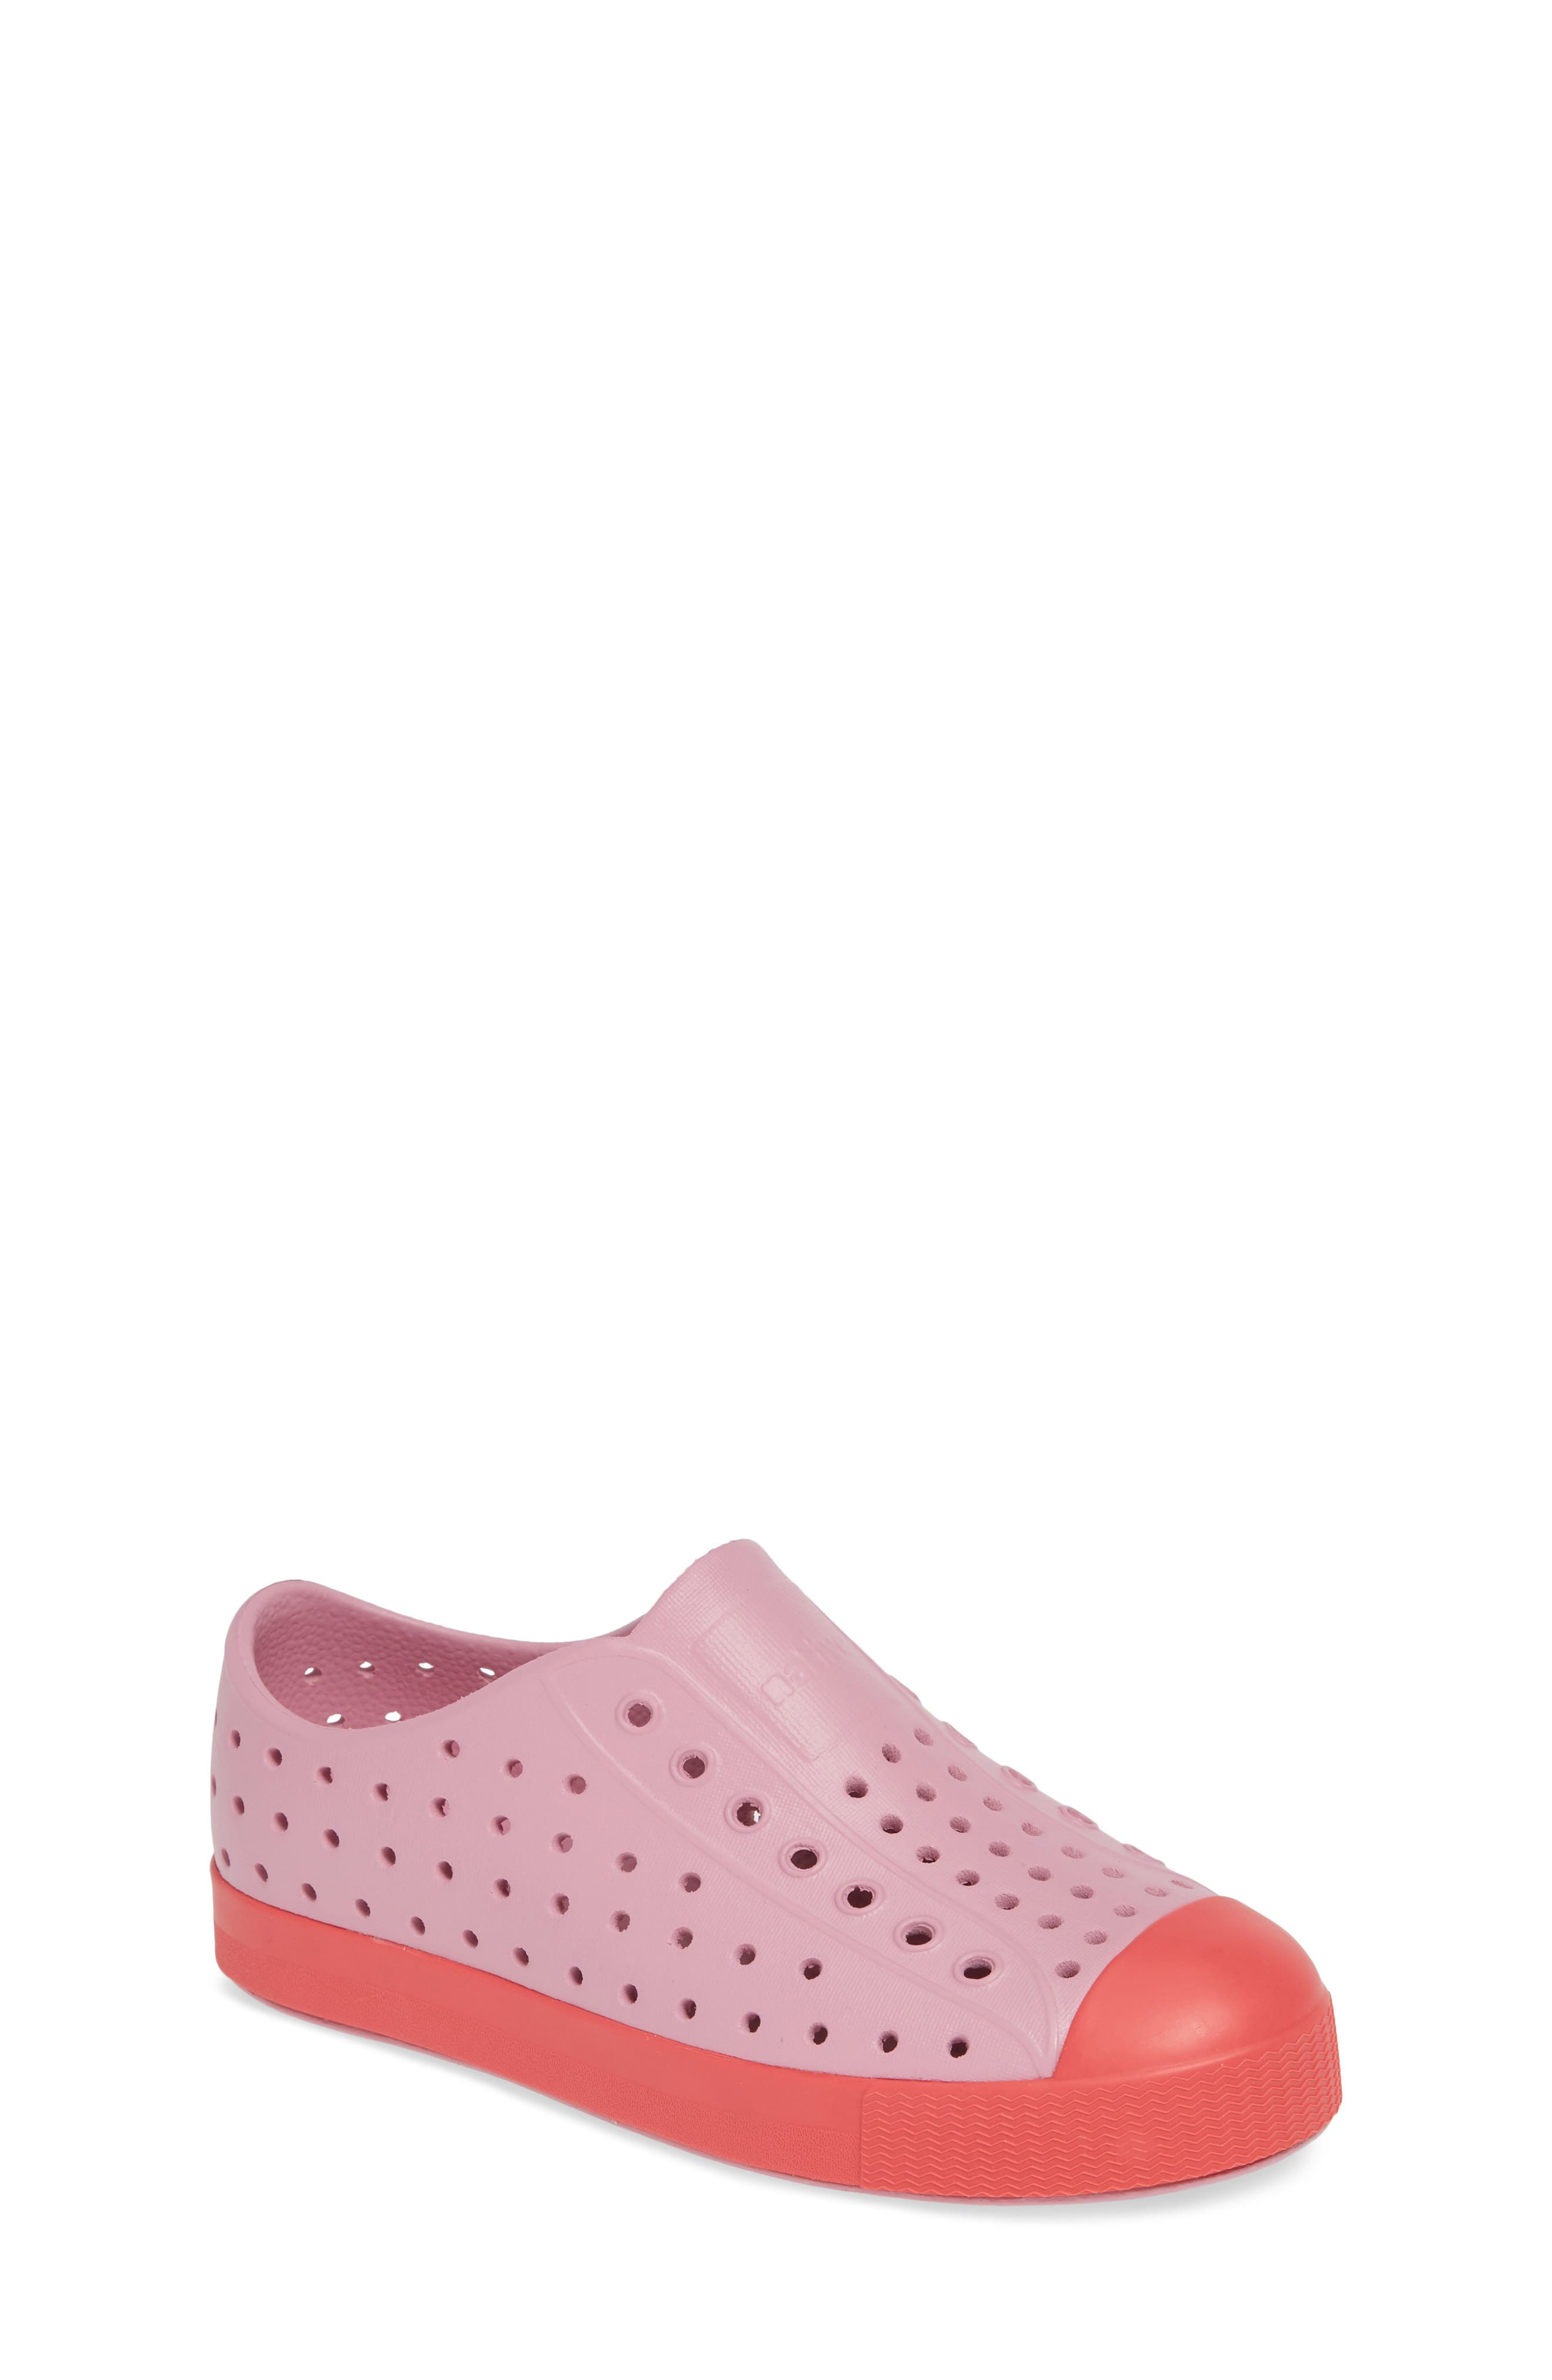 4adae086e7e7 Girls  Native Shoes Shoes